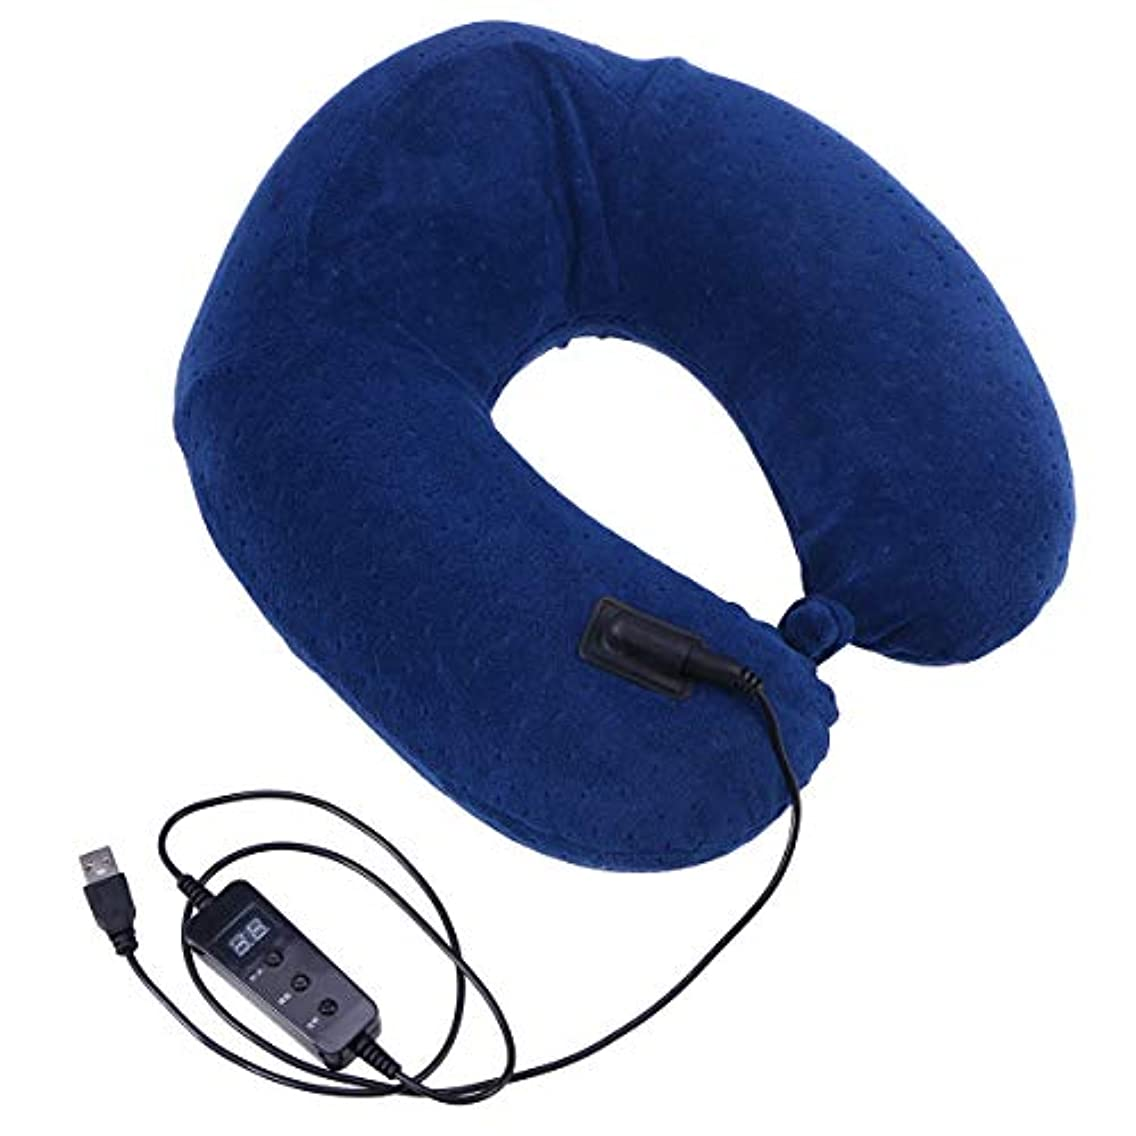 HEALIFTY ネック牽引USBソフトメモリフォーム枕のヒーターU字型ネックサポートクッション車のためのトレーンホームまたはオフィスバッテリなし(ネイビー)